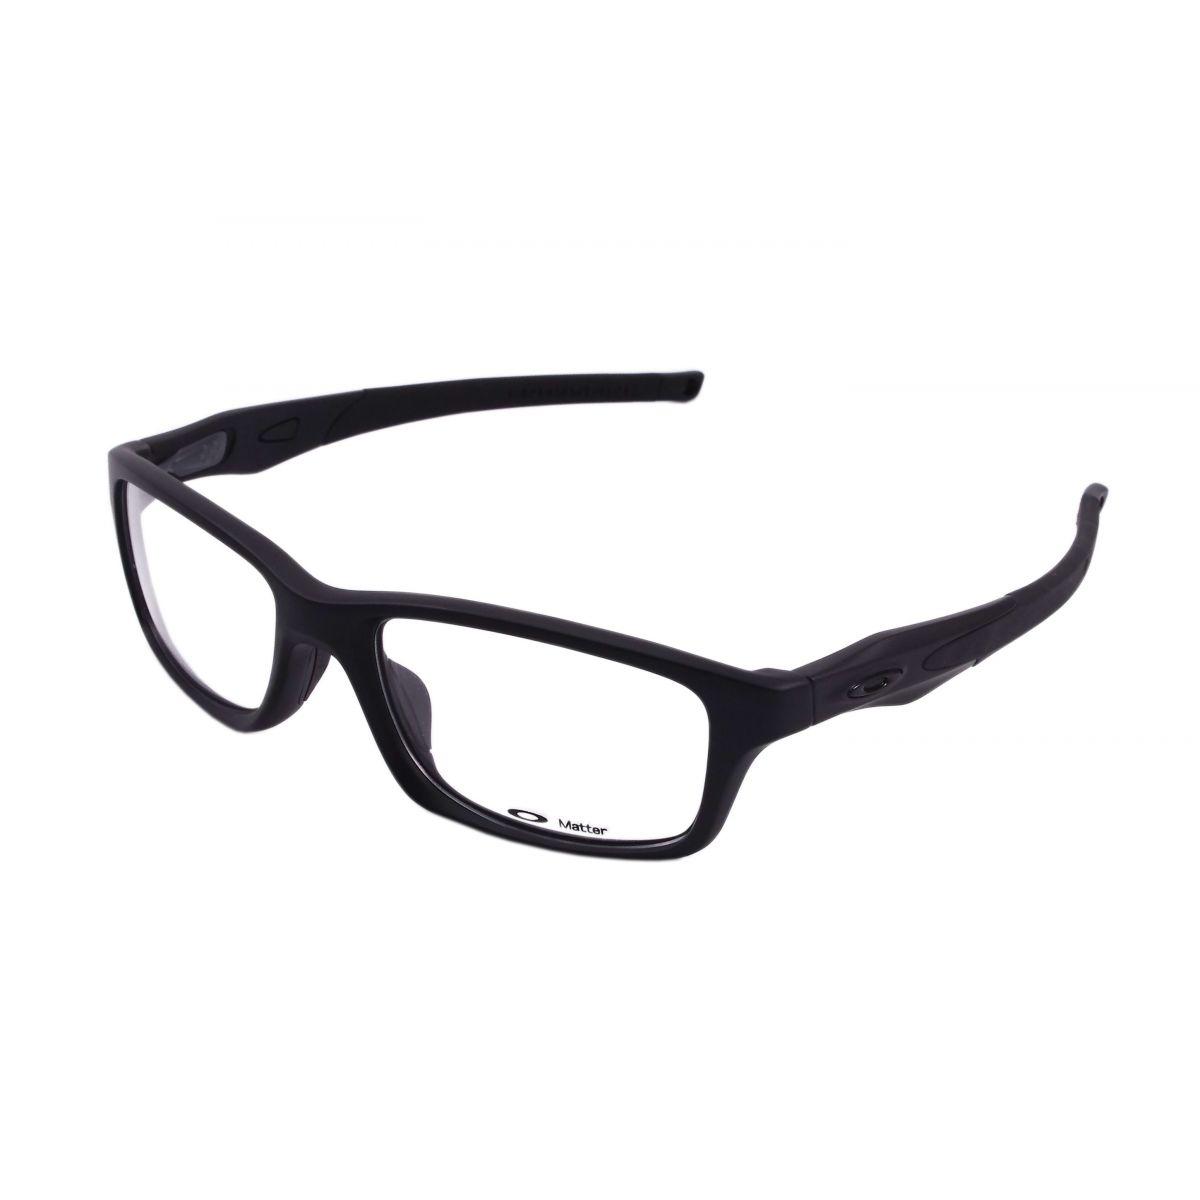 e99d464f5f3e6 Óculos De Grau Oakley Crosslink OX8030 05 Tam.55Oakley ...